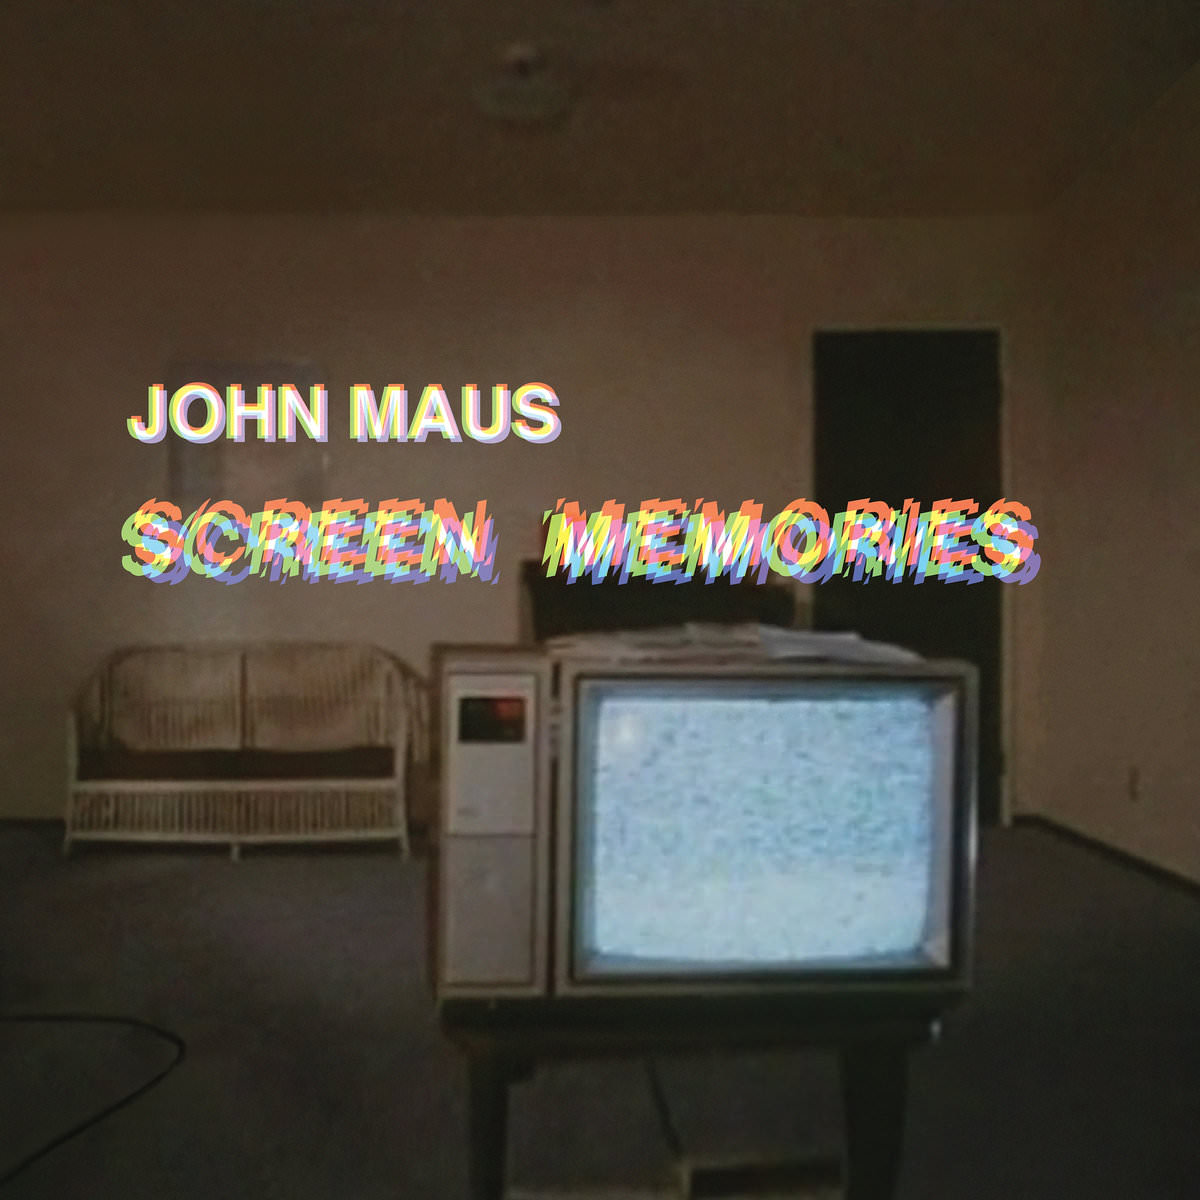 Four John Maus songs for Seattle Winter   KXSU 102 1 FM